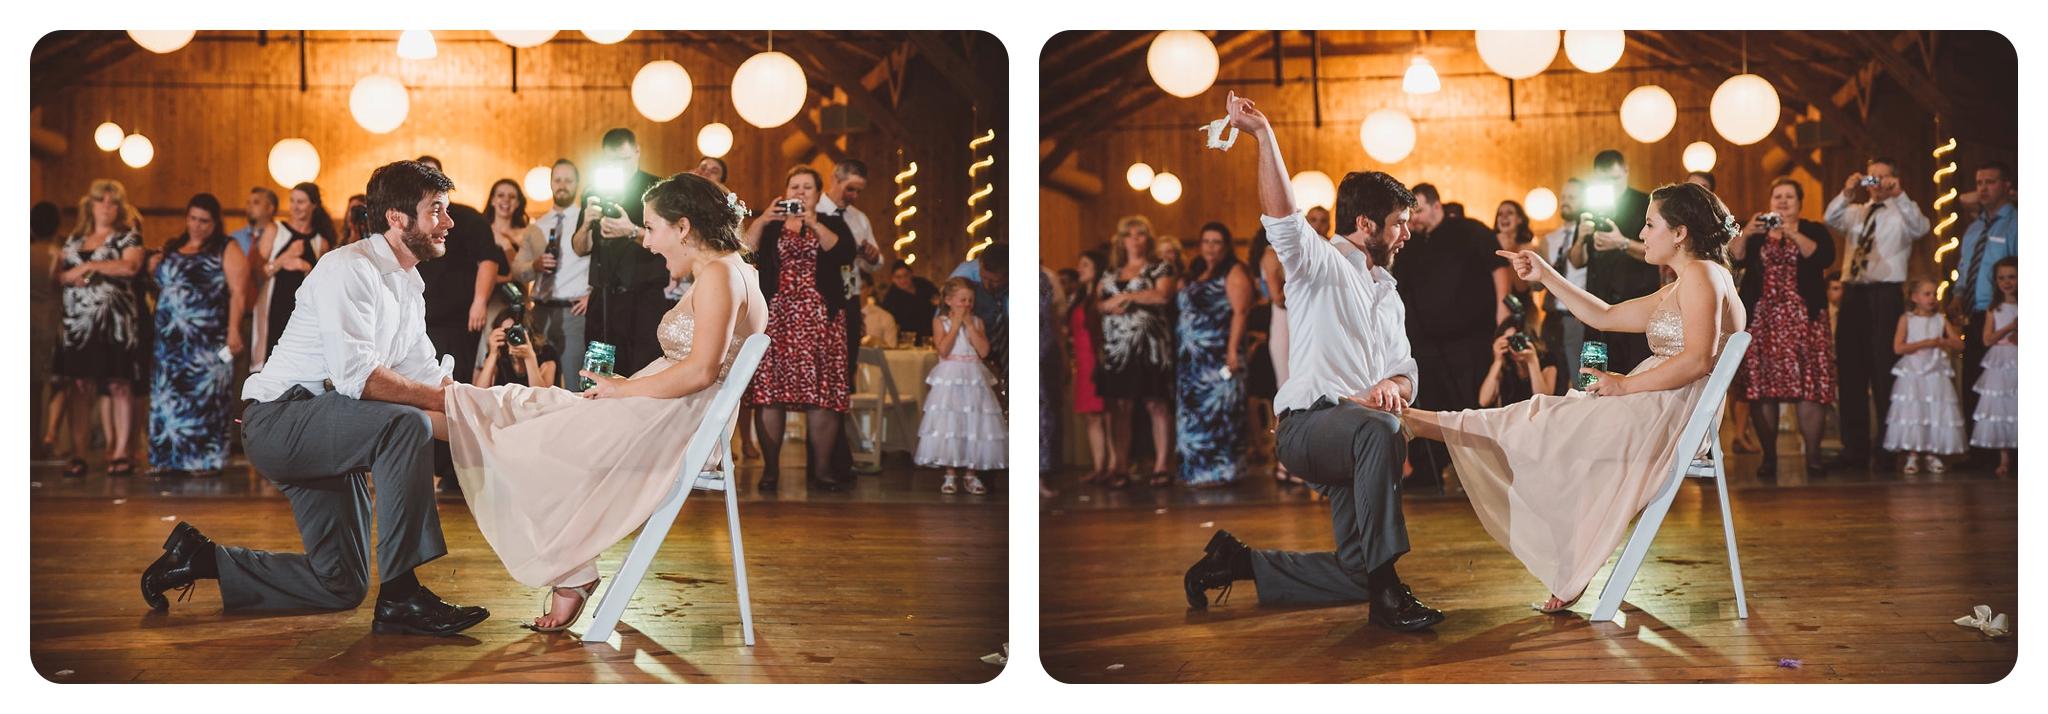 Braeloch-Weddings-Wedding-Photographer-Pat-Cori-Photography-048.jpg